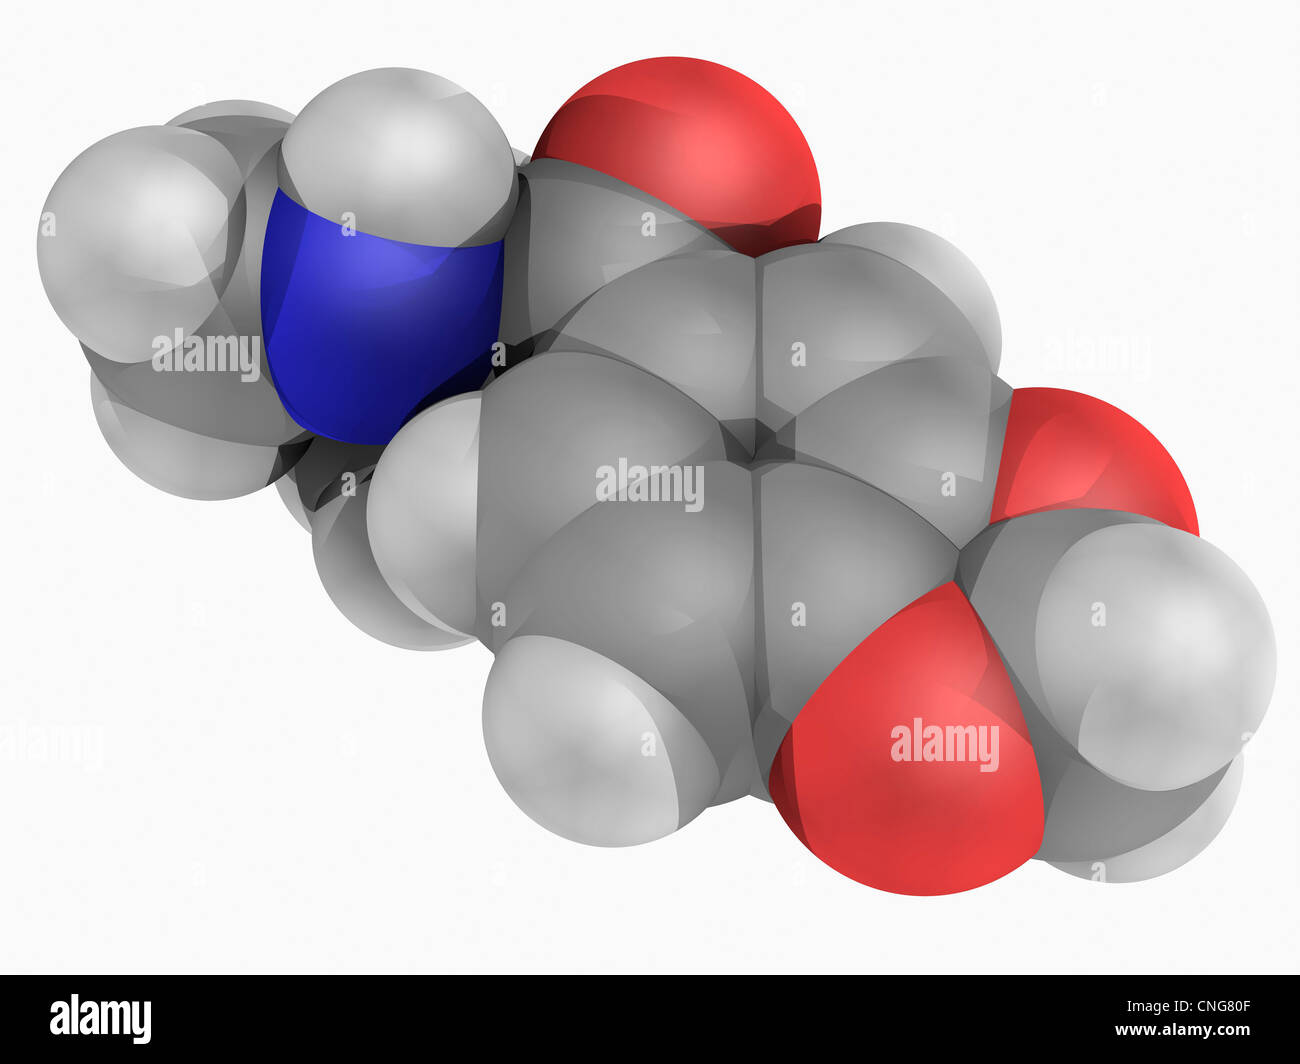 Methylone molécula de drogas Imagen De Stock